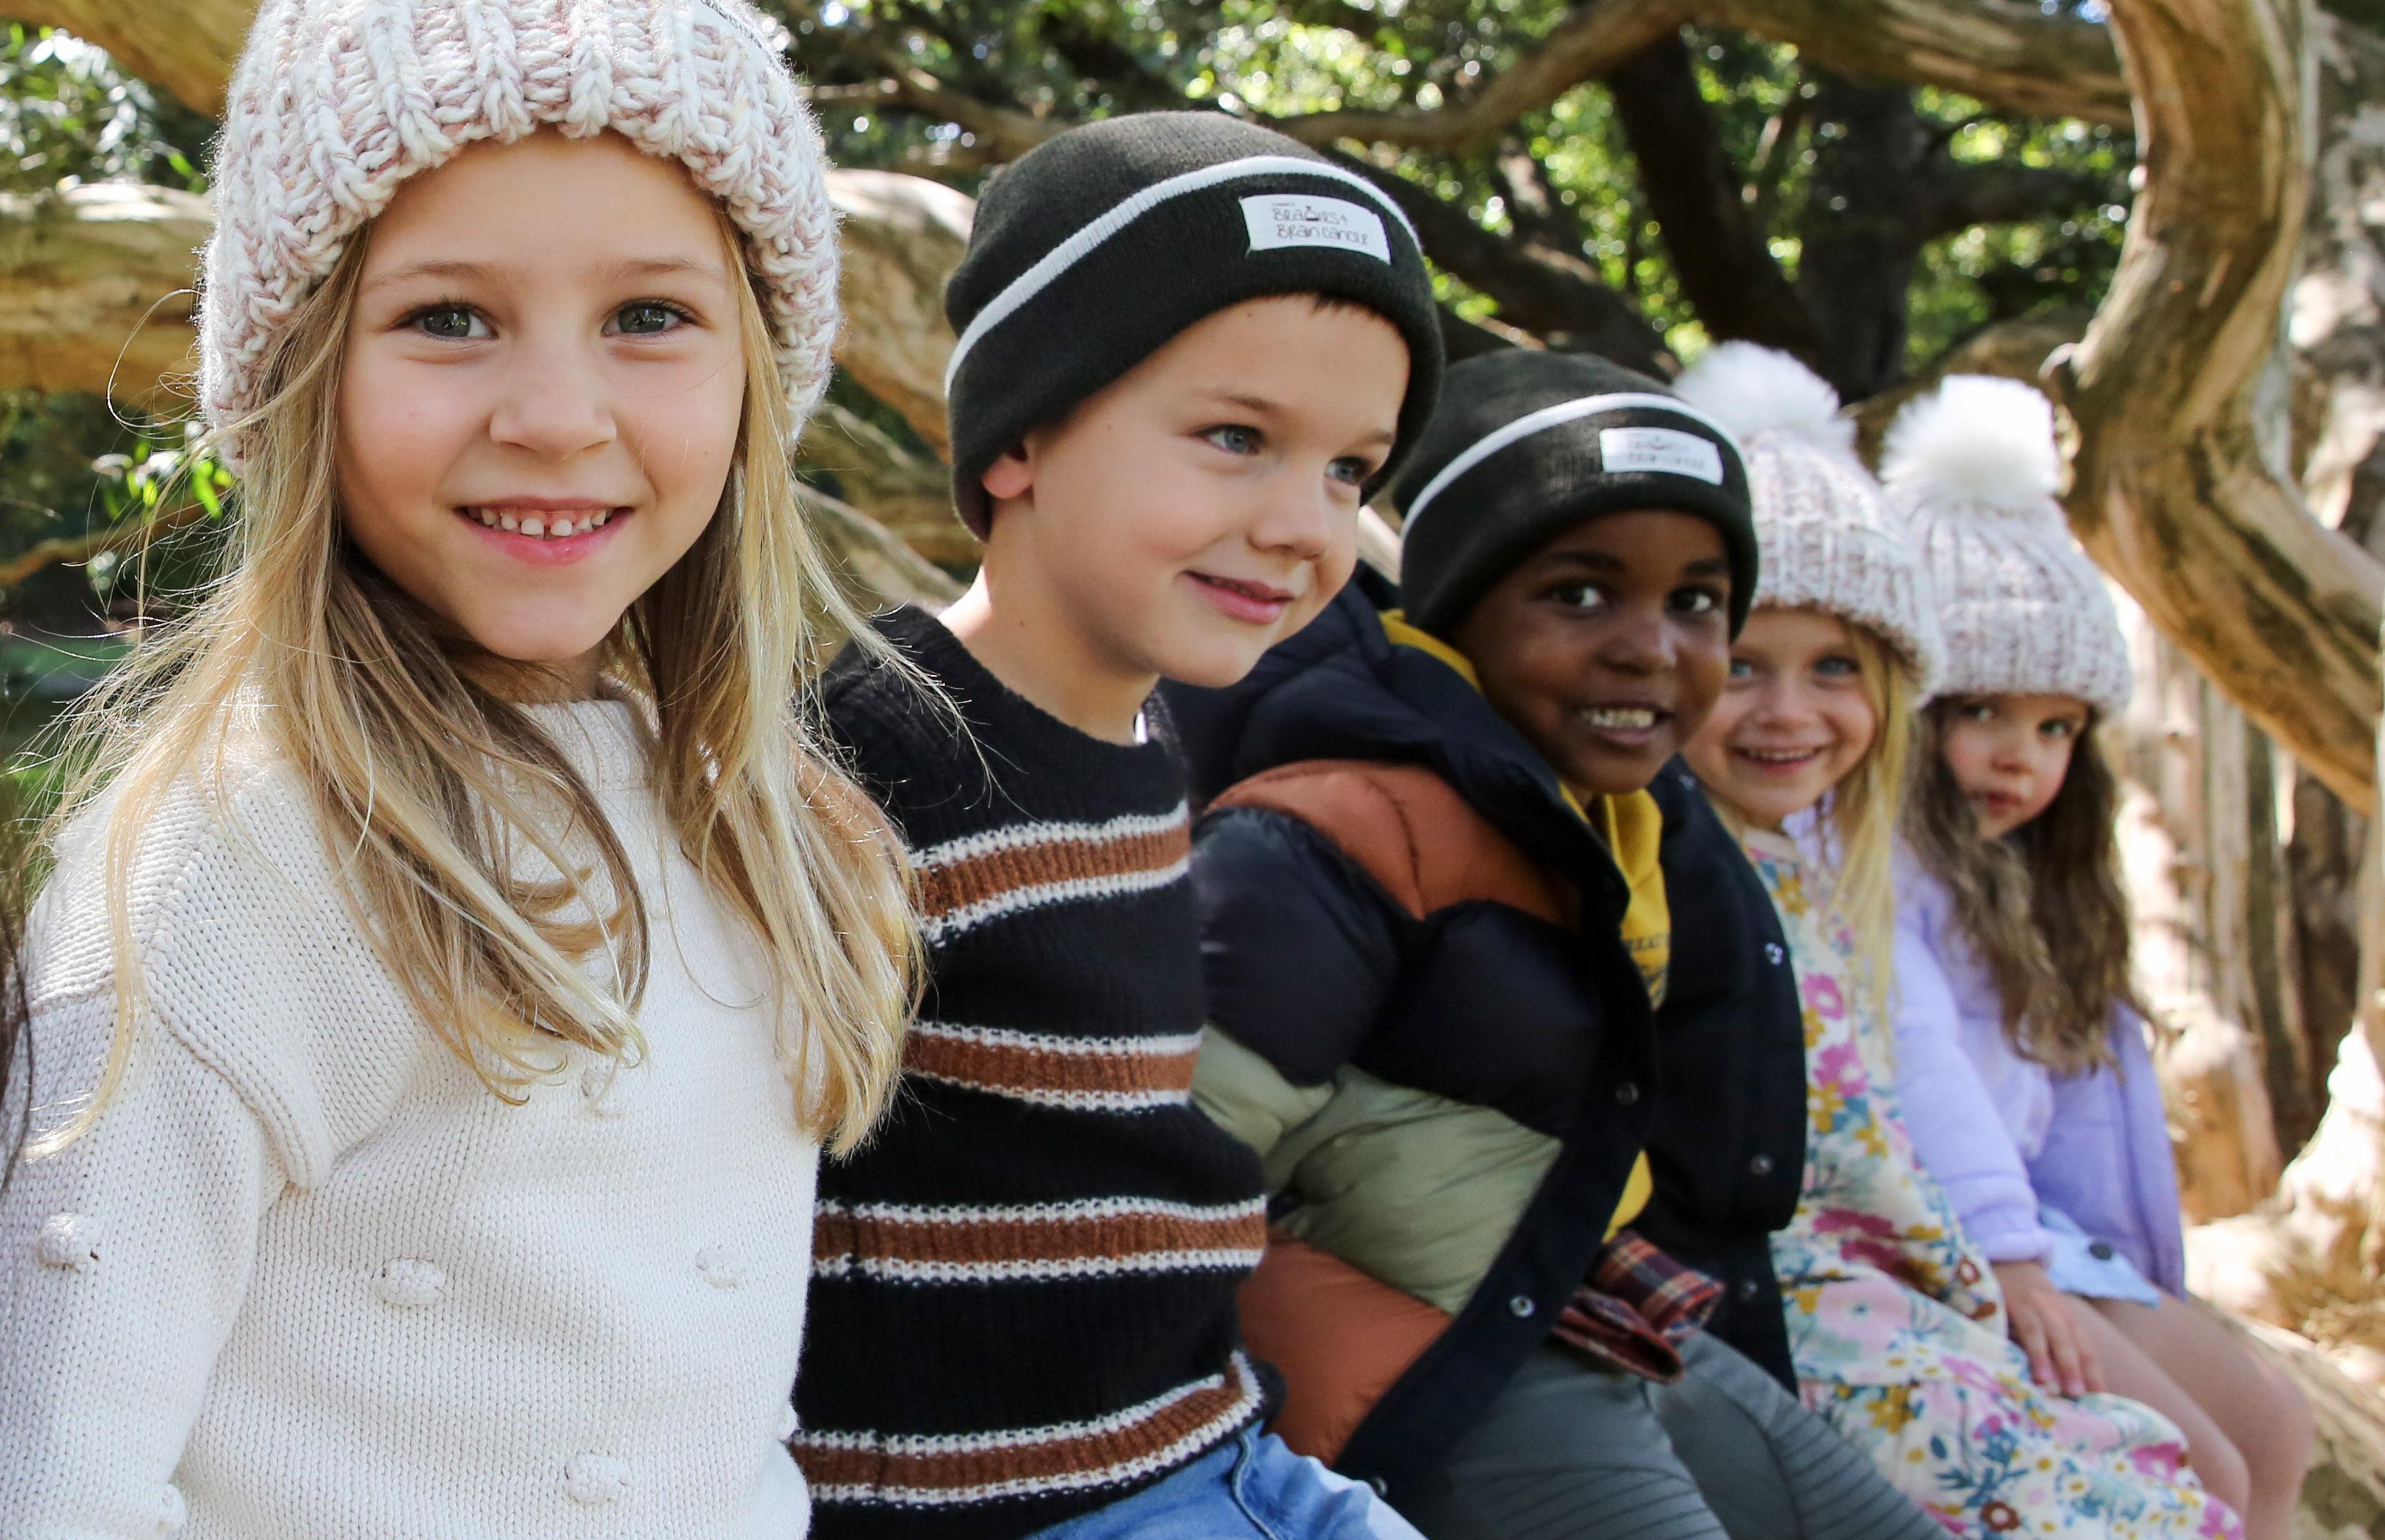 Kids wearing beanies